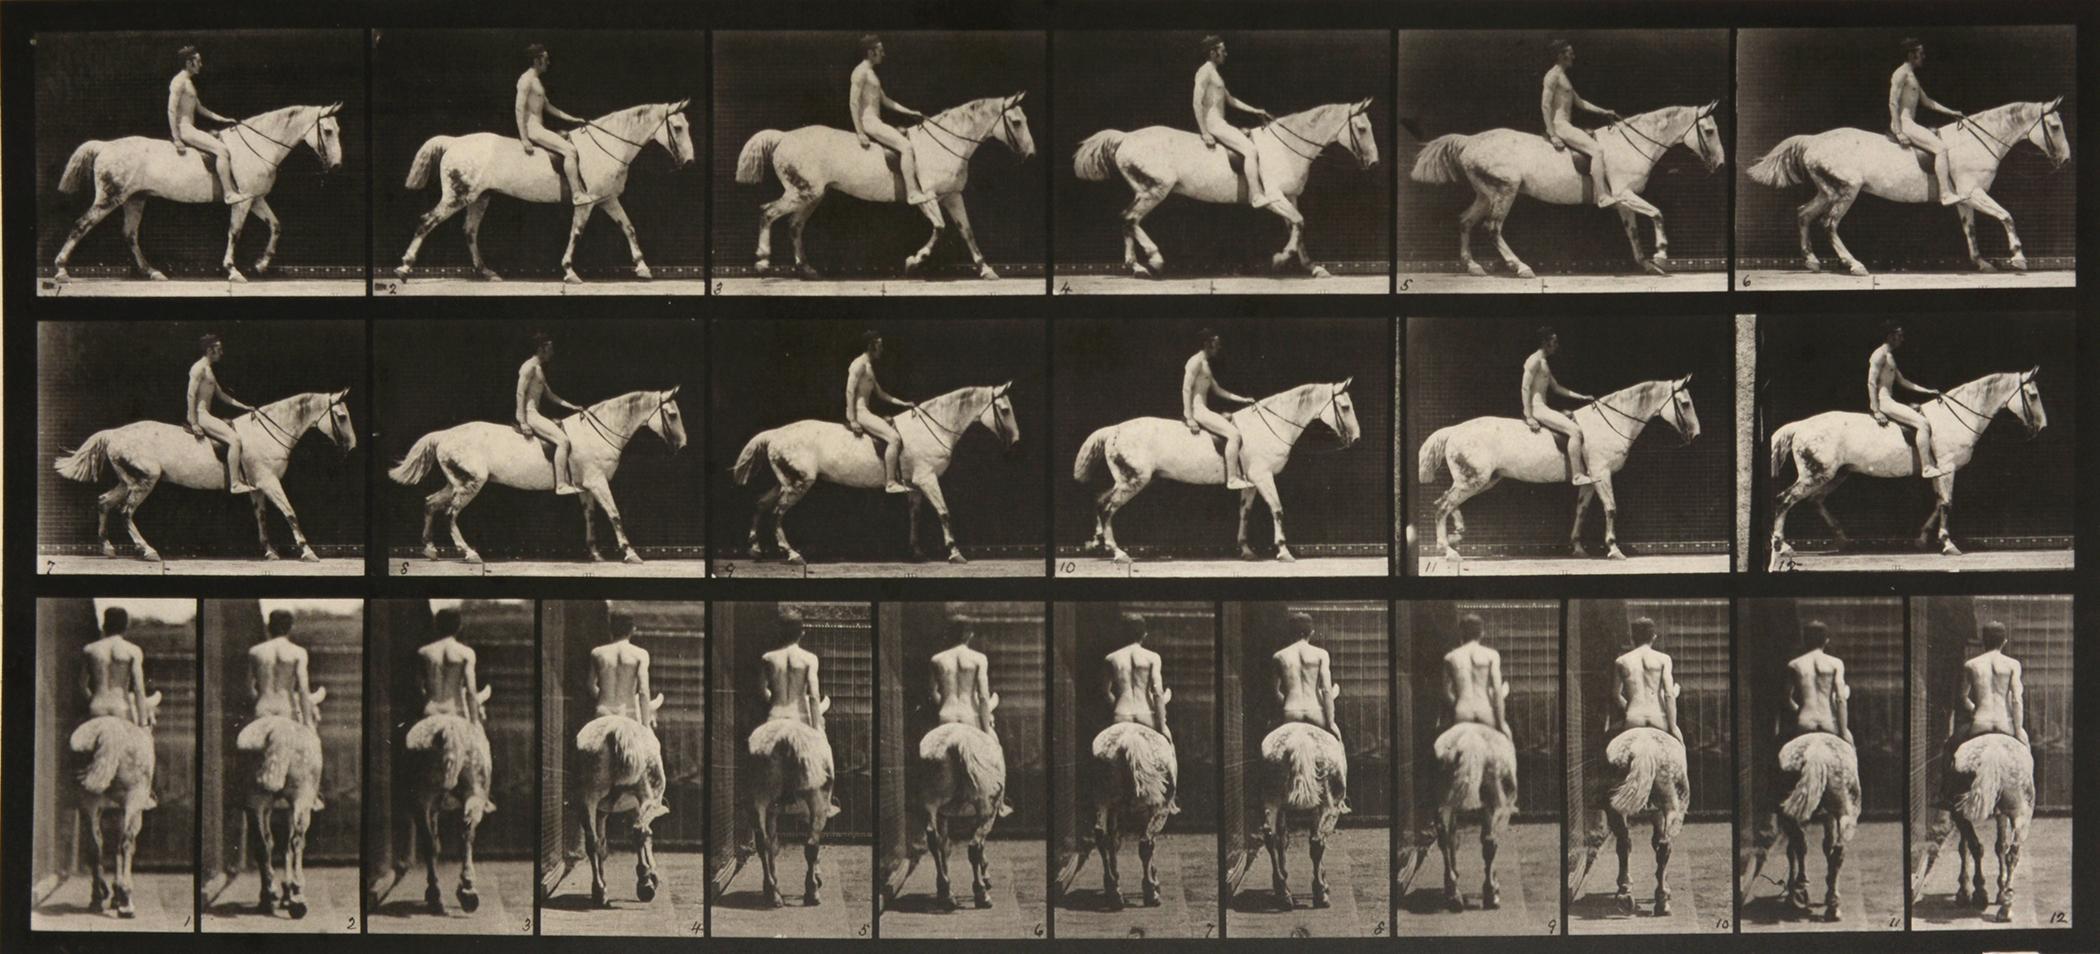 Animal Locomotion: Plate 582 (Nude Man Riding Horse), 1887 - Eadweard Muybridge